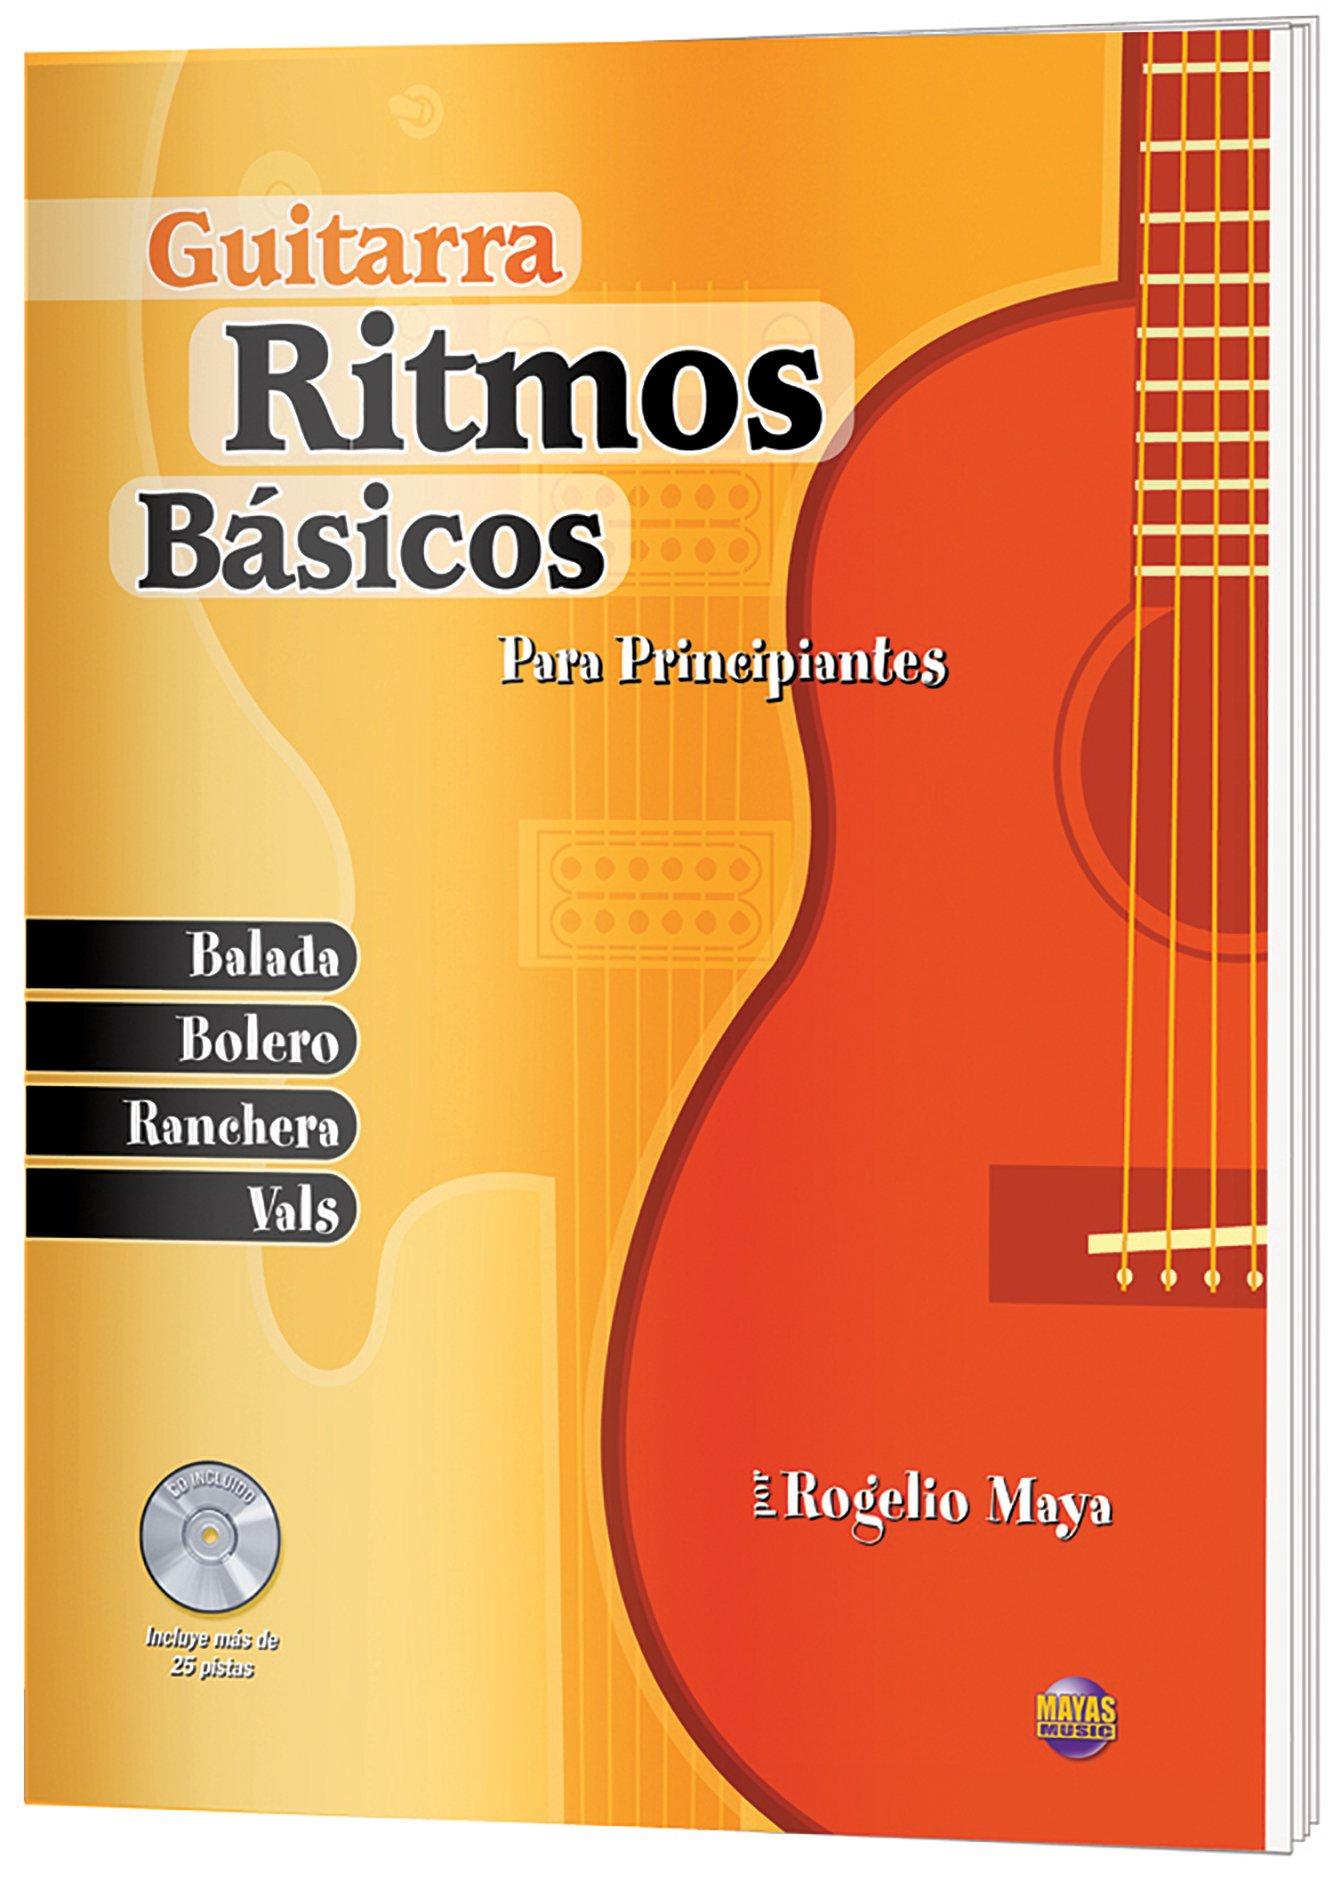 Ritmos Basicos - Guitarra: Para Principiantes Spanish Language ...